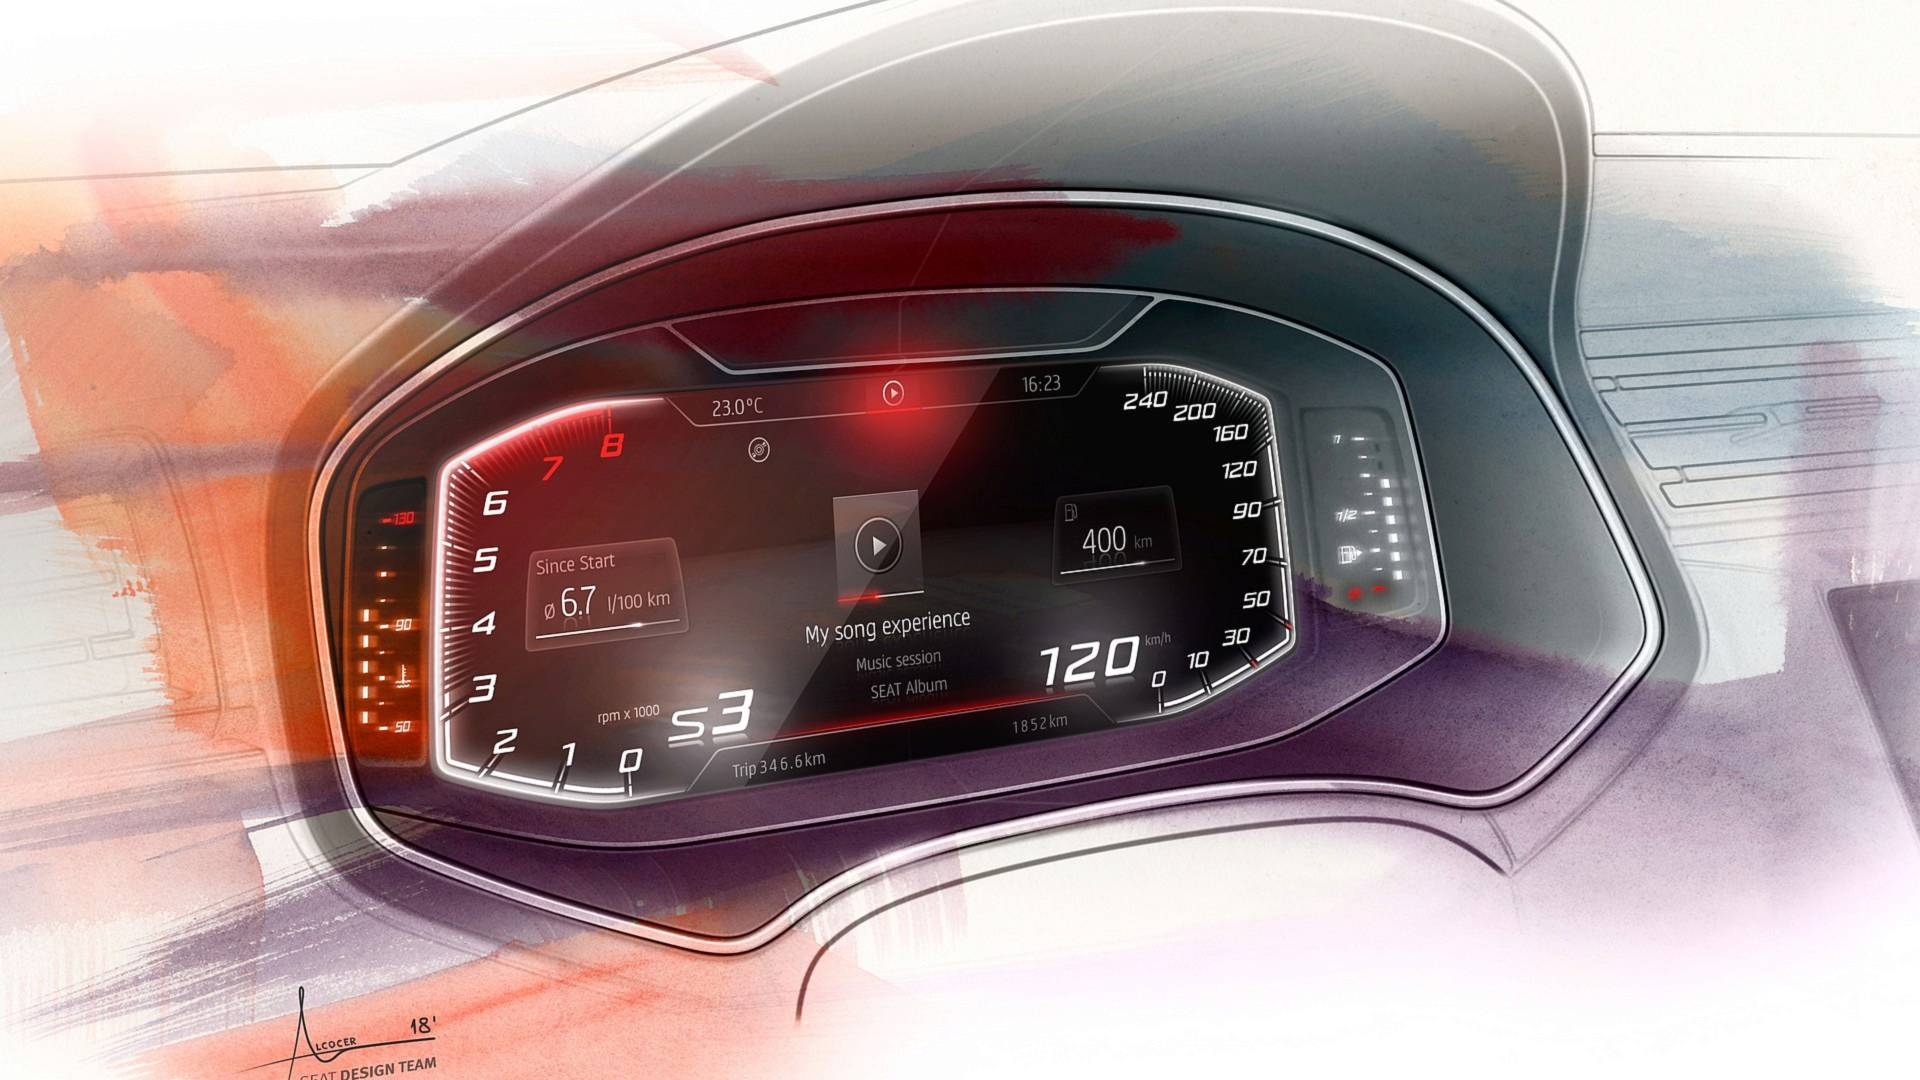 SEAT Digital Cockpit Now Available For Ibiza, Arona